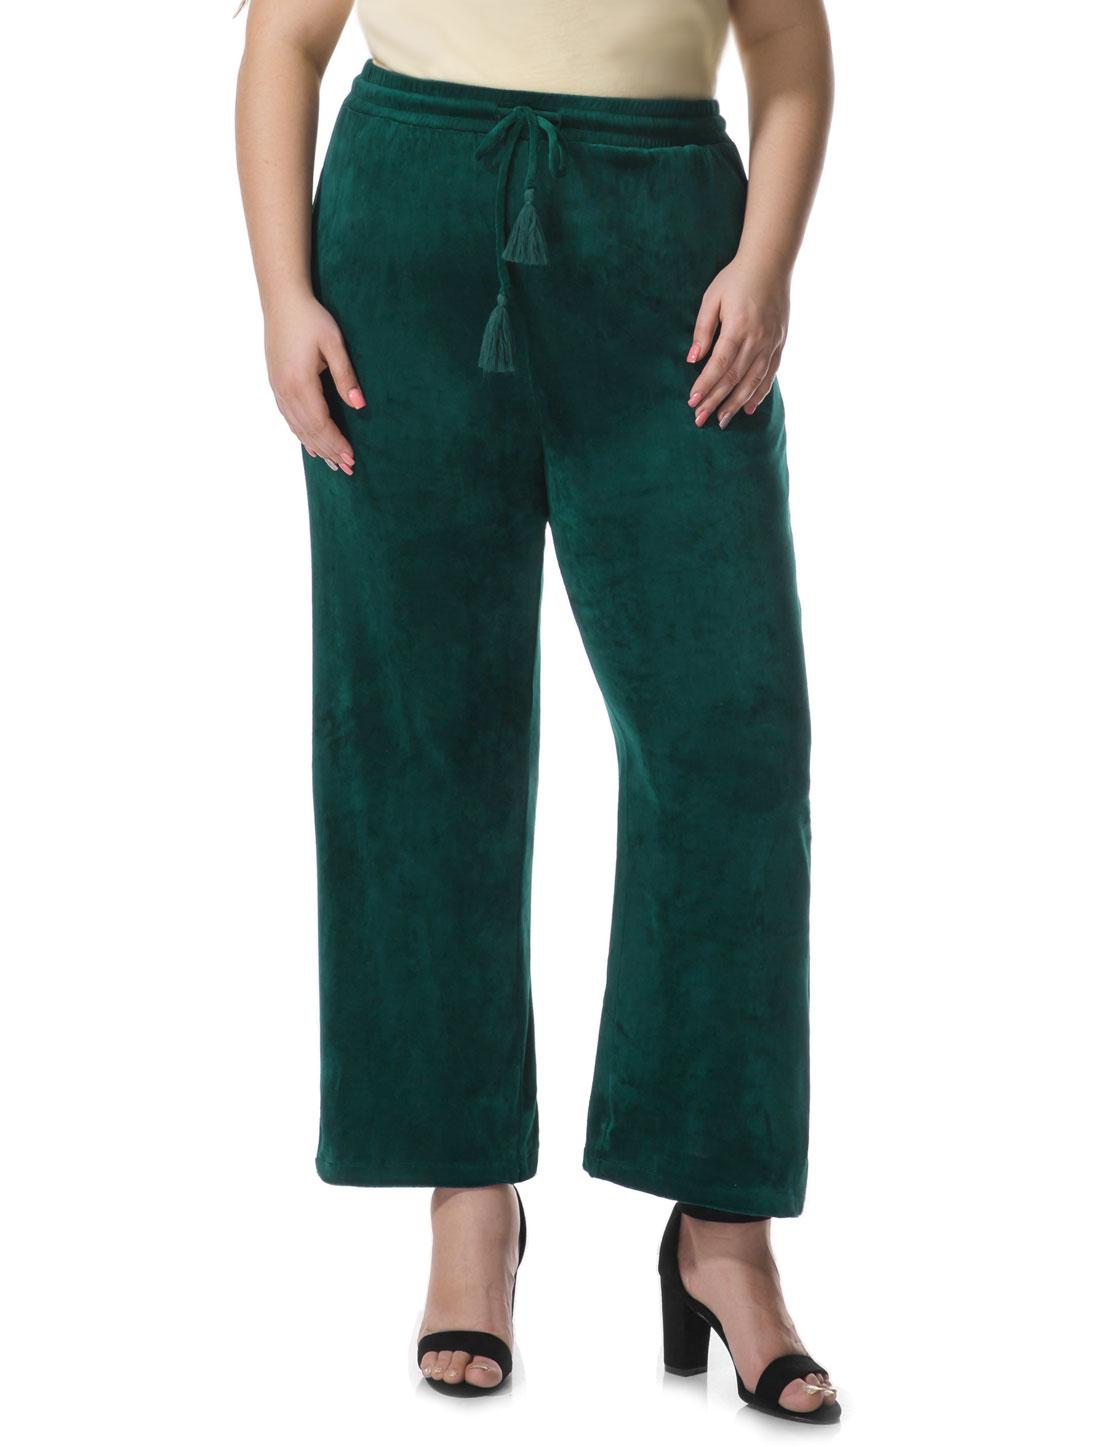 Women Plus Size Velvet Elastic Waist Drawstring Pants Green 1X